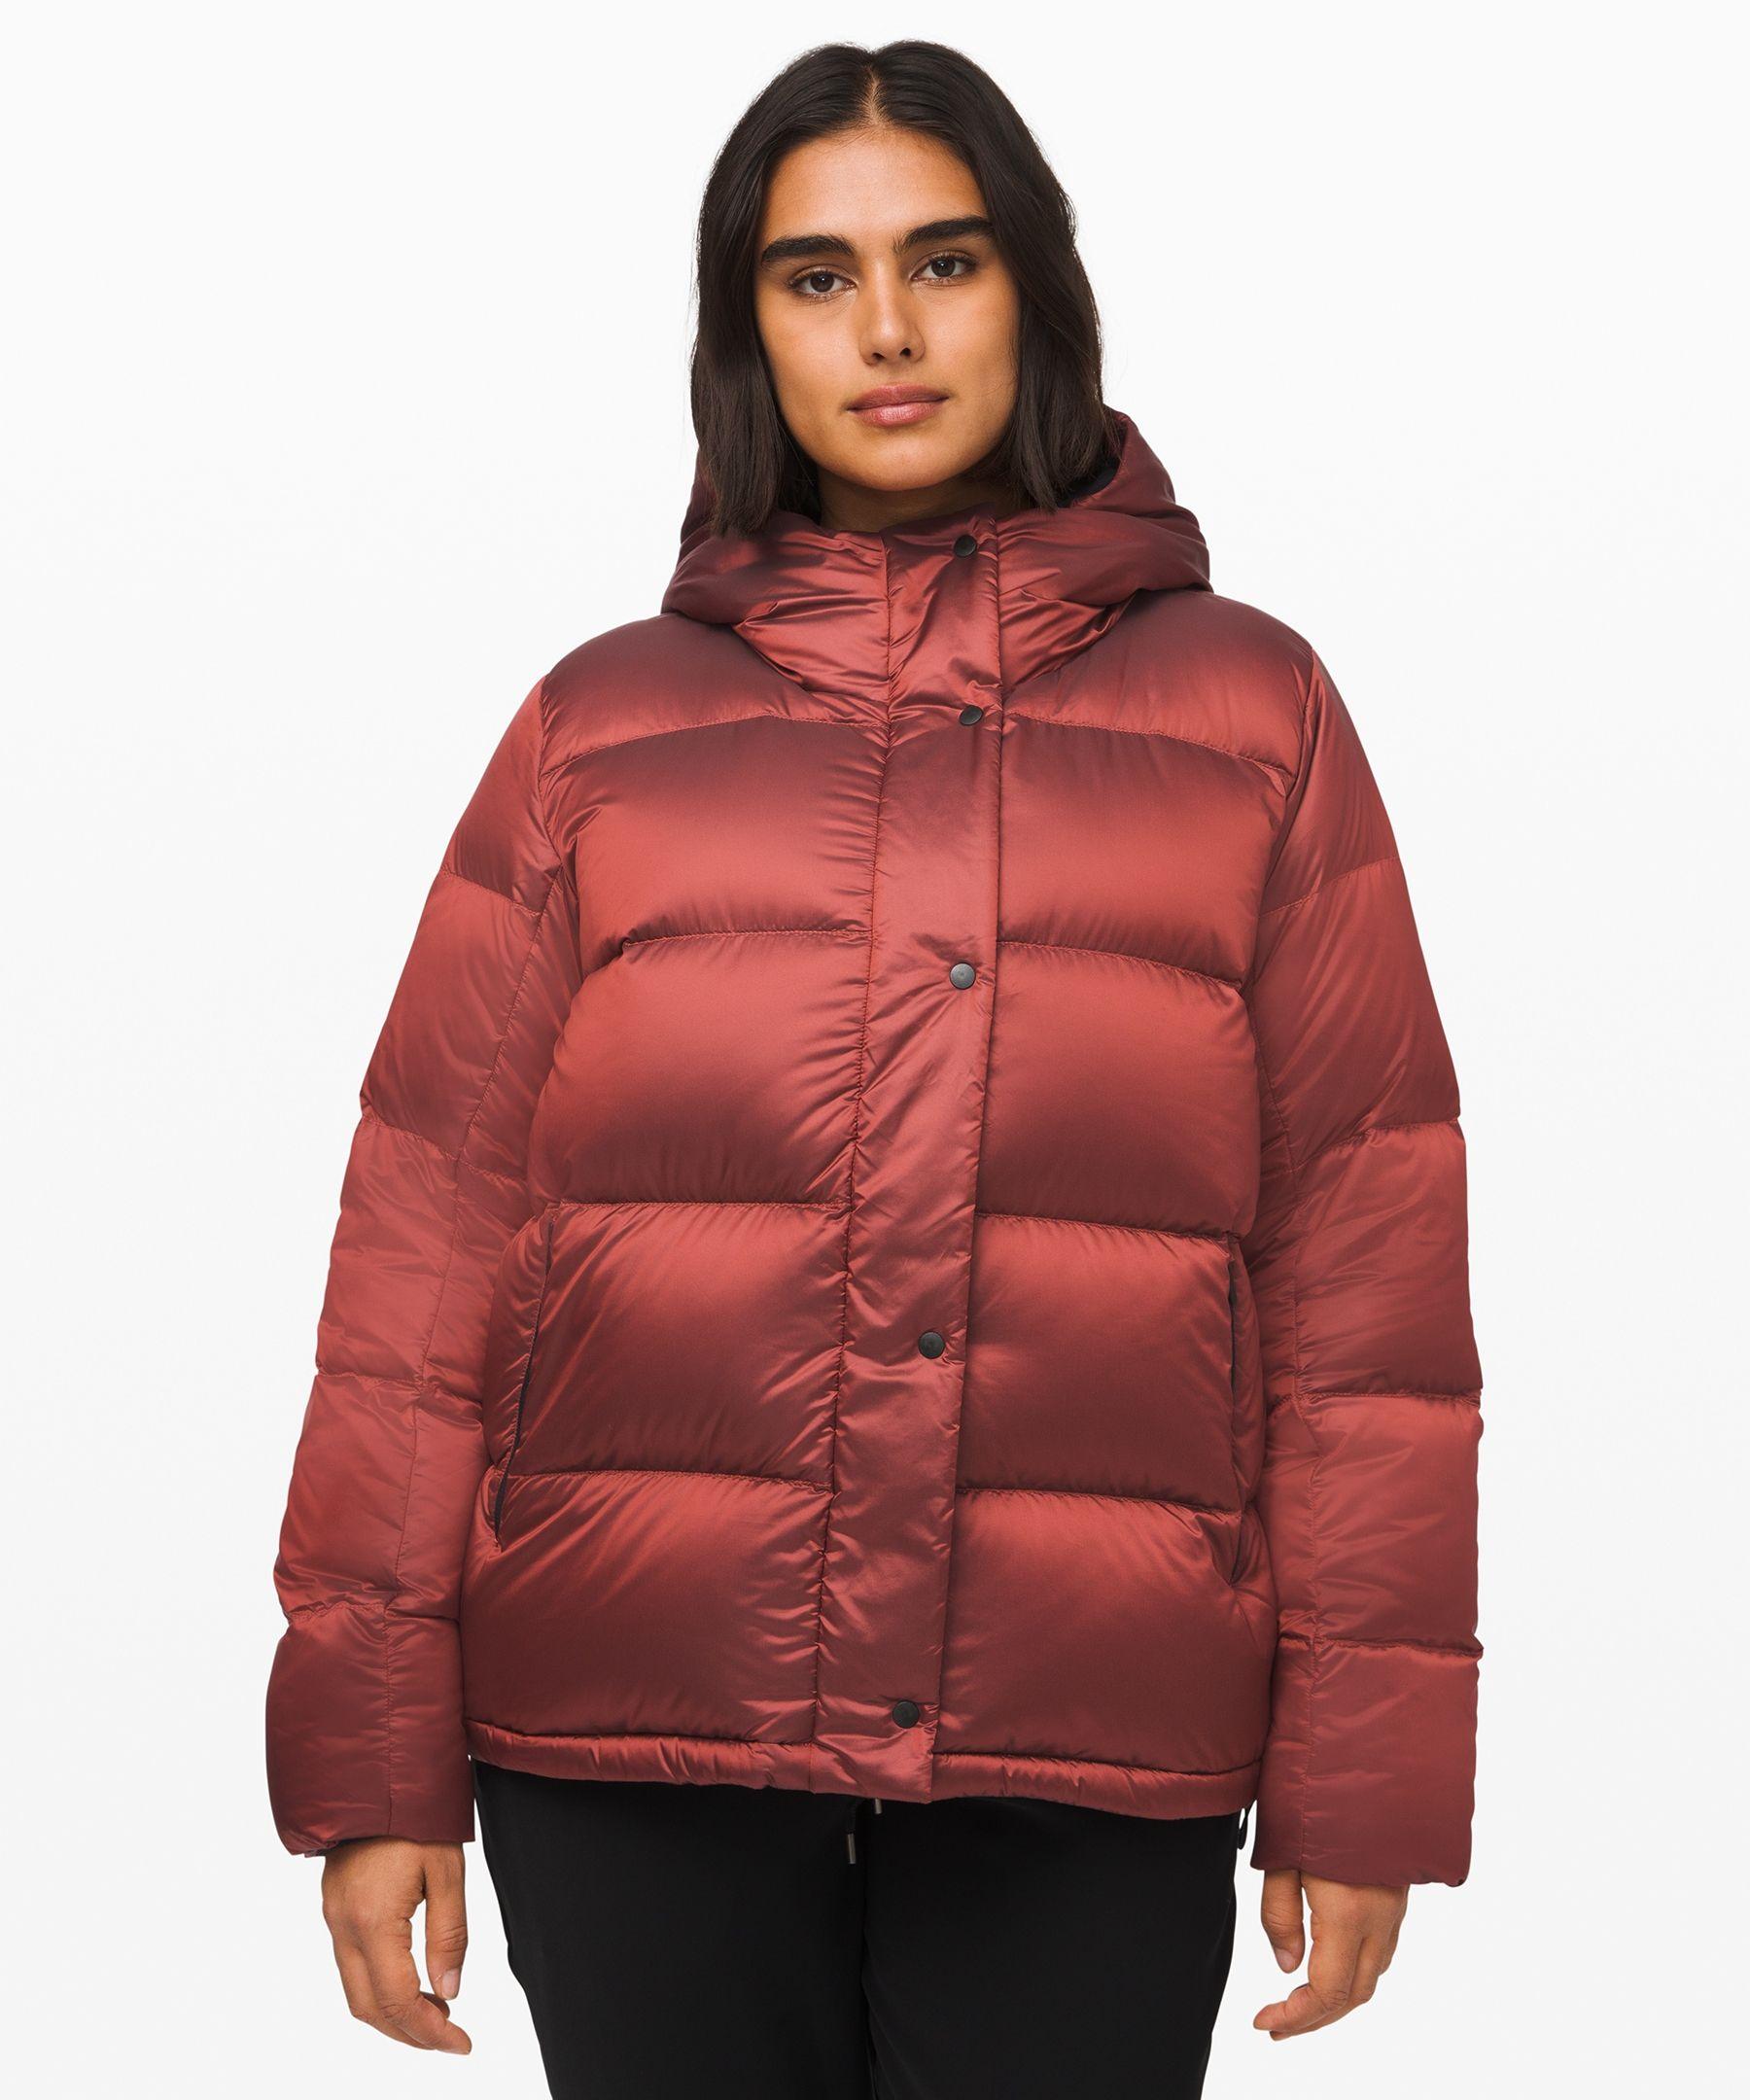 Wunder Puff Jacket Women S Jackets Coats Lululemon Puff Jacket Coats Jackets Women Jackets For Women [ 2160 x 1800 Pixel ]